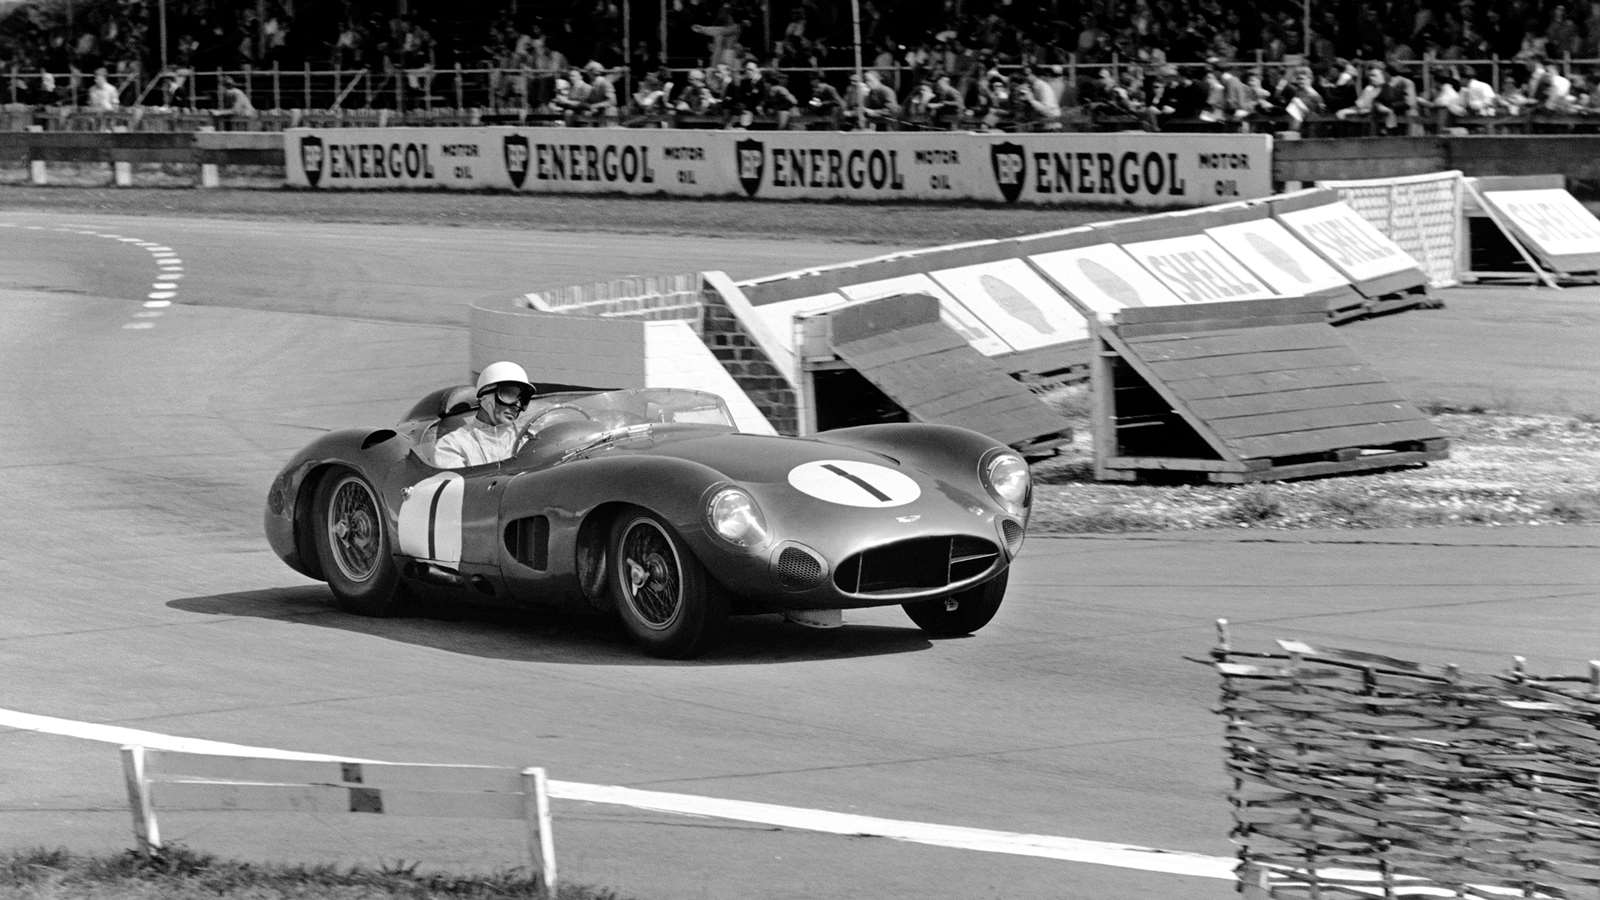 How The Dbr1 Gave Aston Martin The 1959 World Sportscar Championship